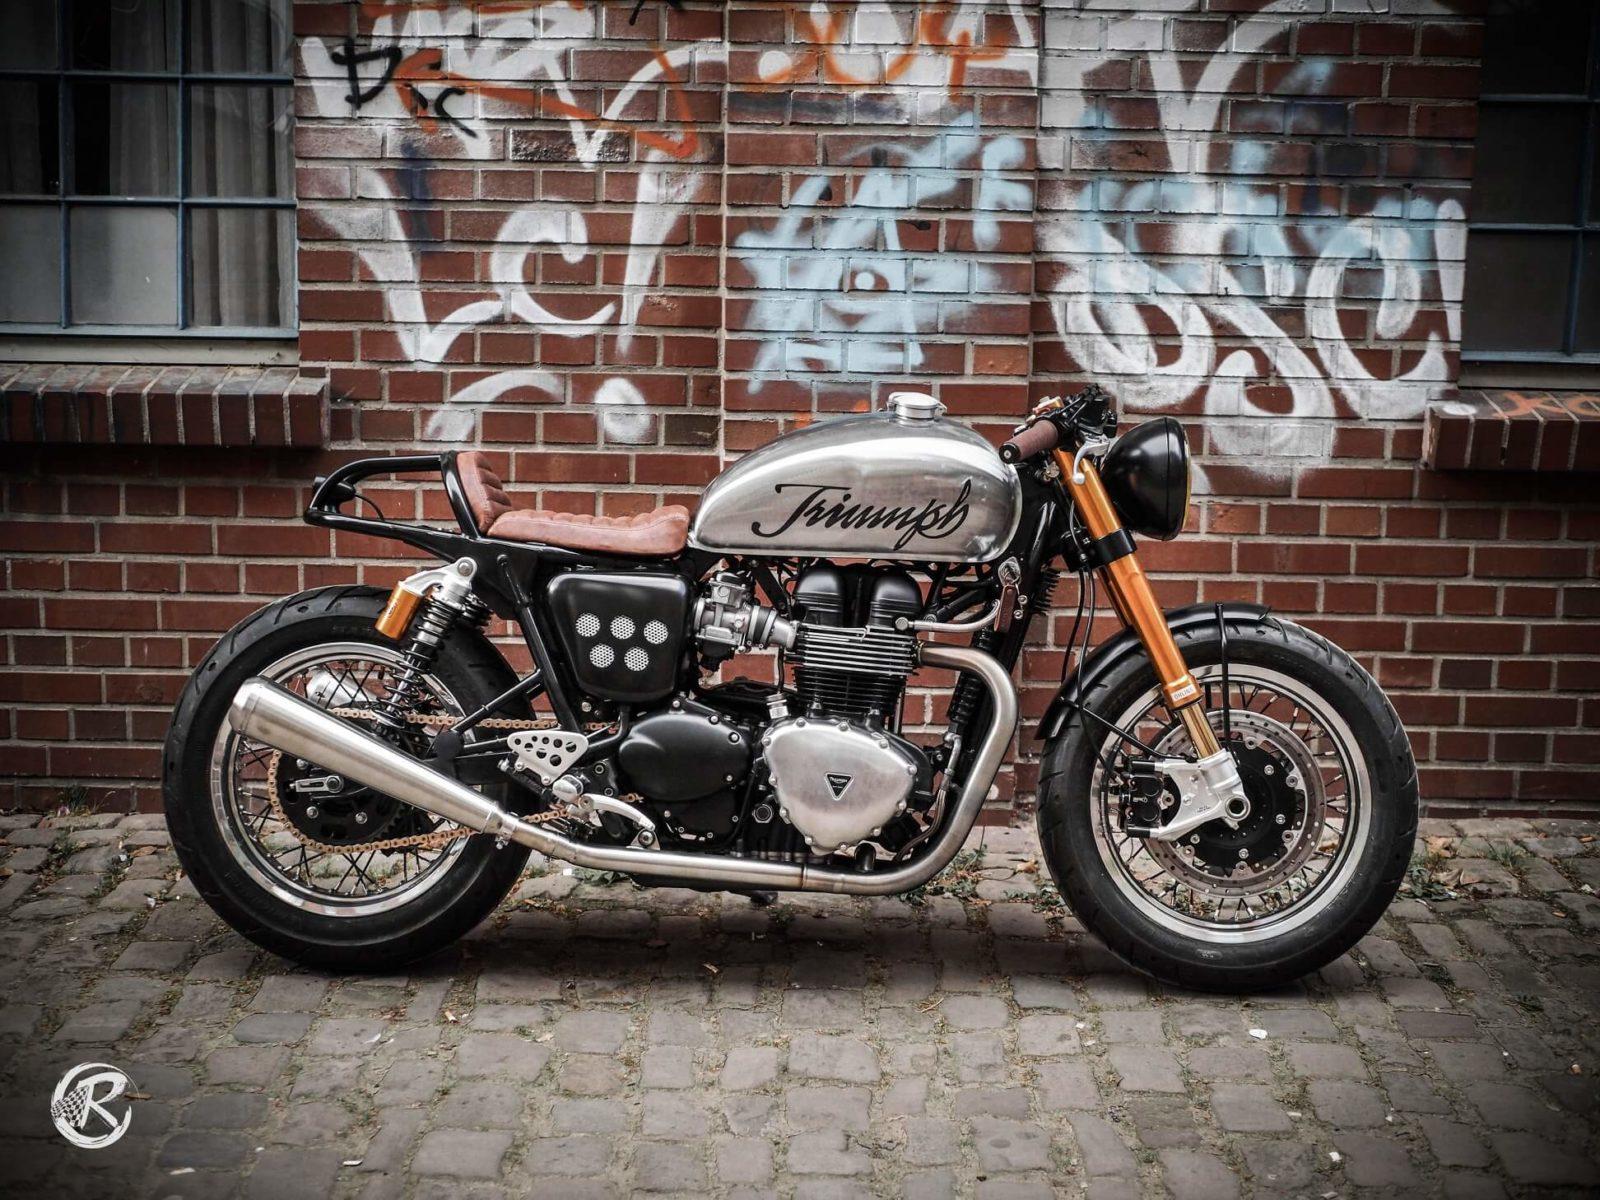 La belle Triumph 900 de Classicbike